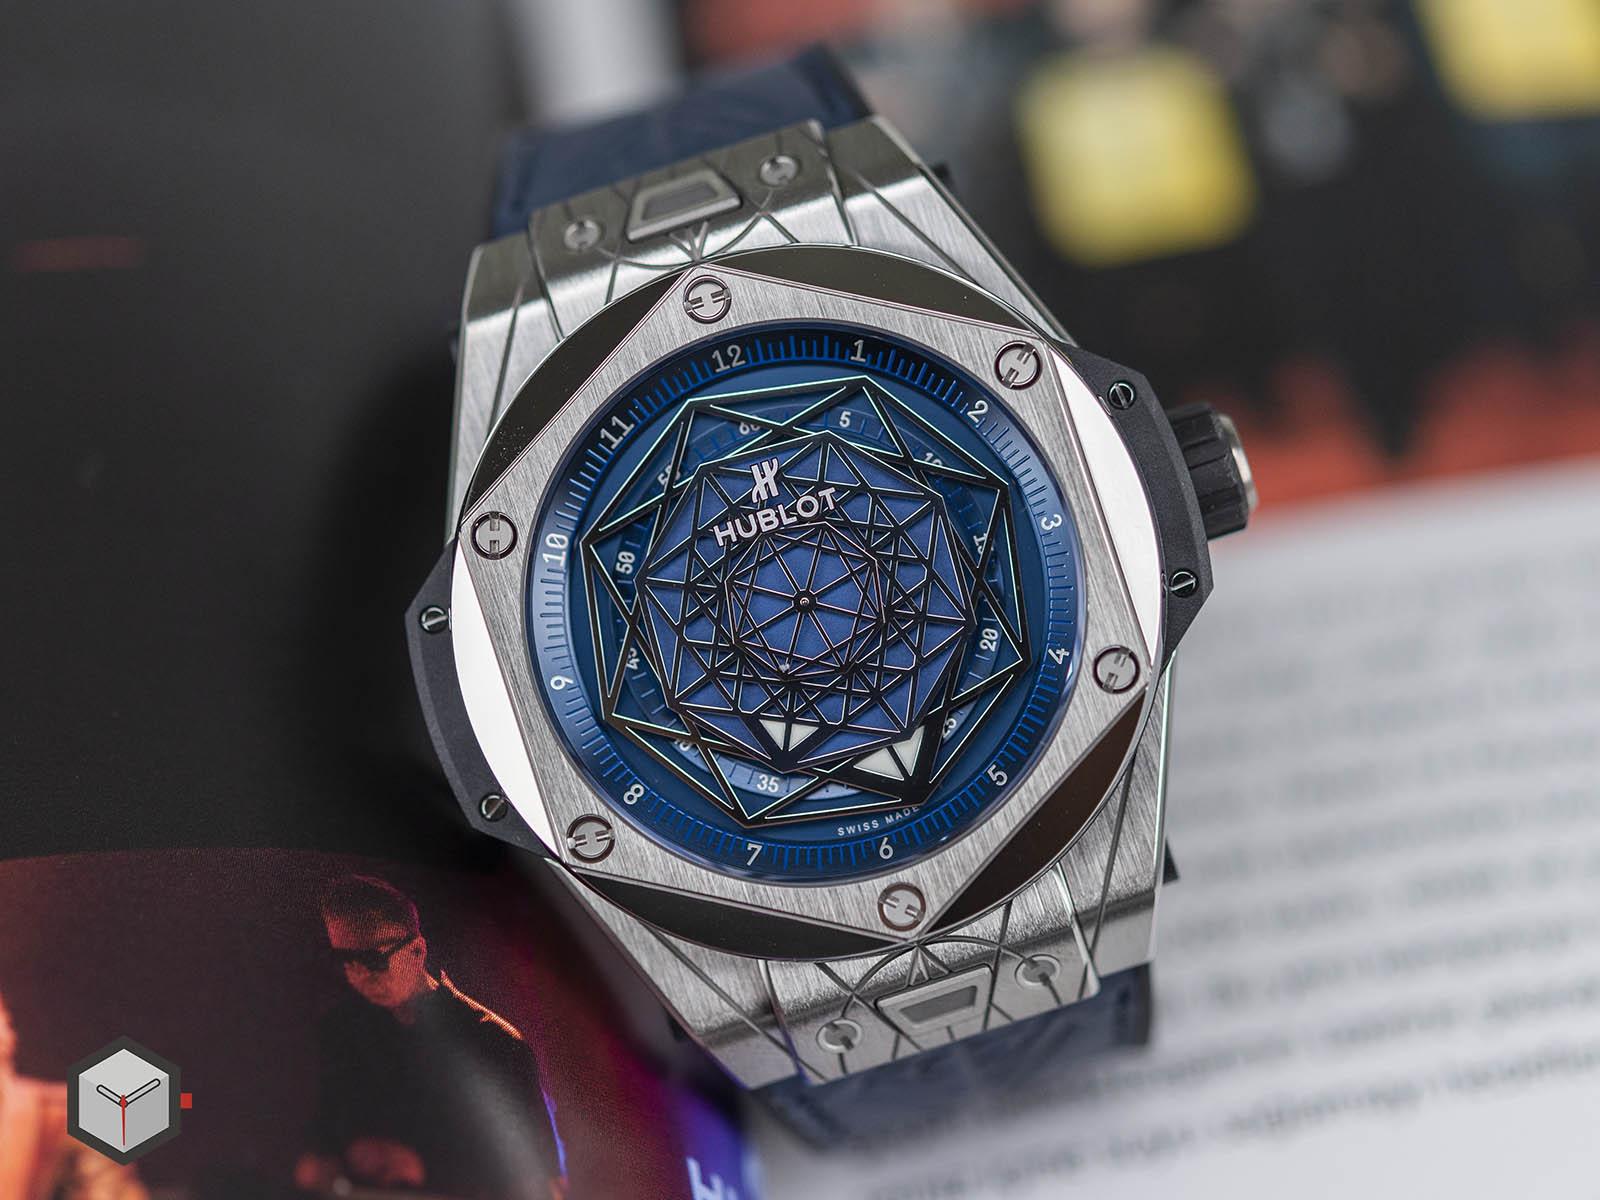 415-nx-7179-vr-mxm18-hublot-big-bang-sang-bleu-titanium-blue-4.jpg